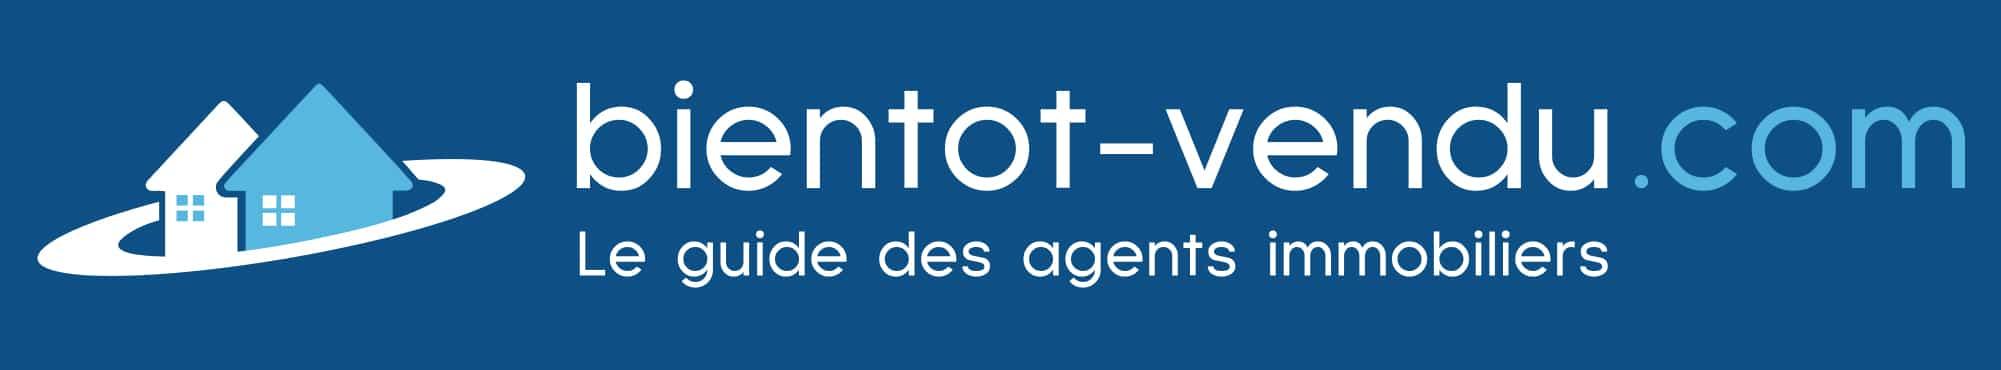 bientot vendu logo